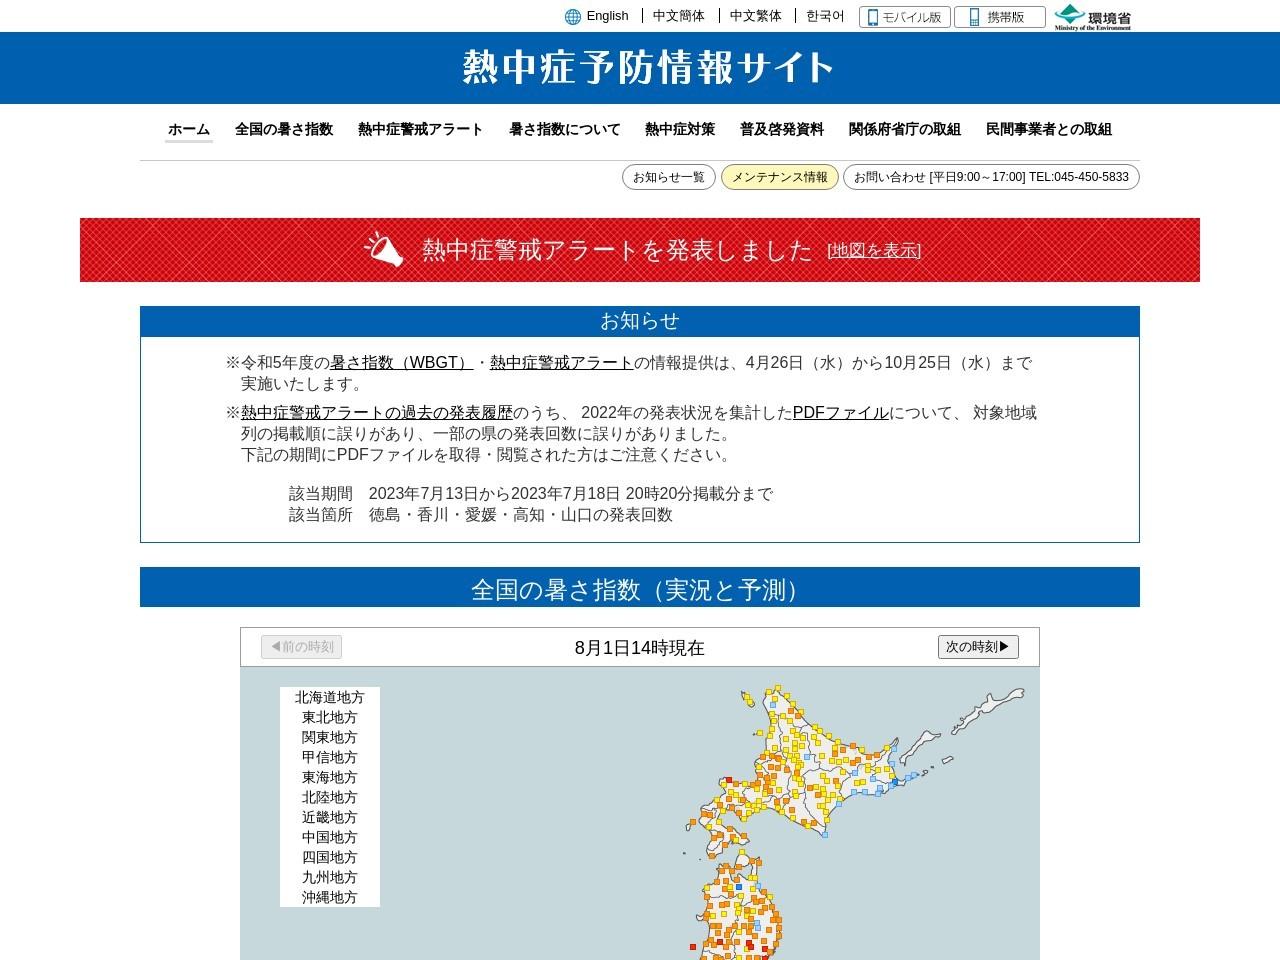 http://www.wbgt.env.go.jp/heatillness_checksheet.php